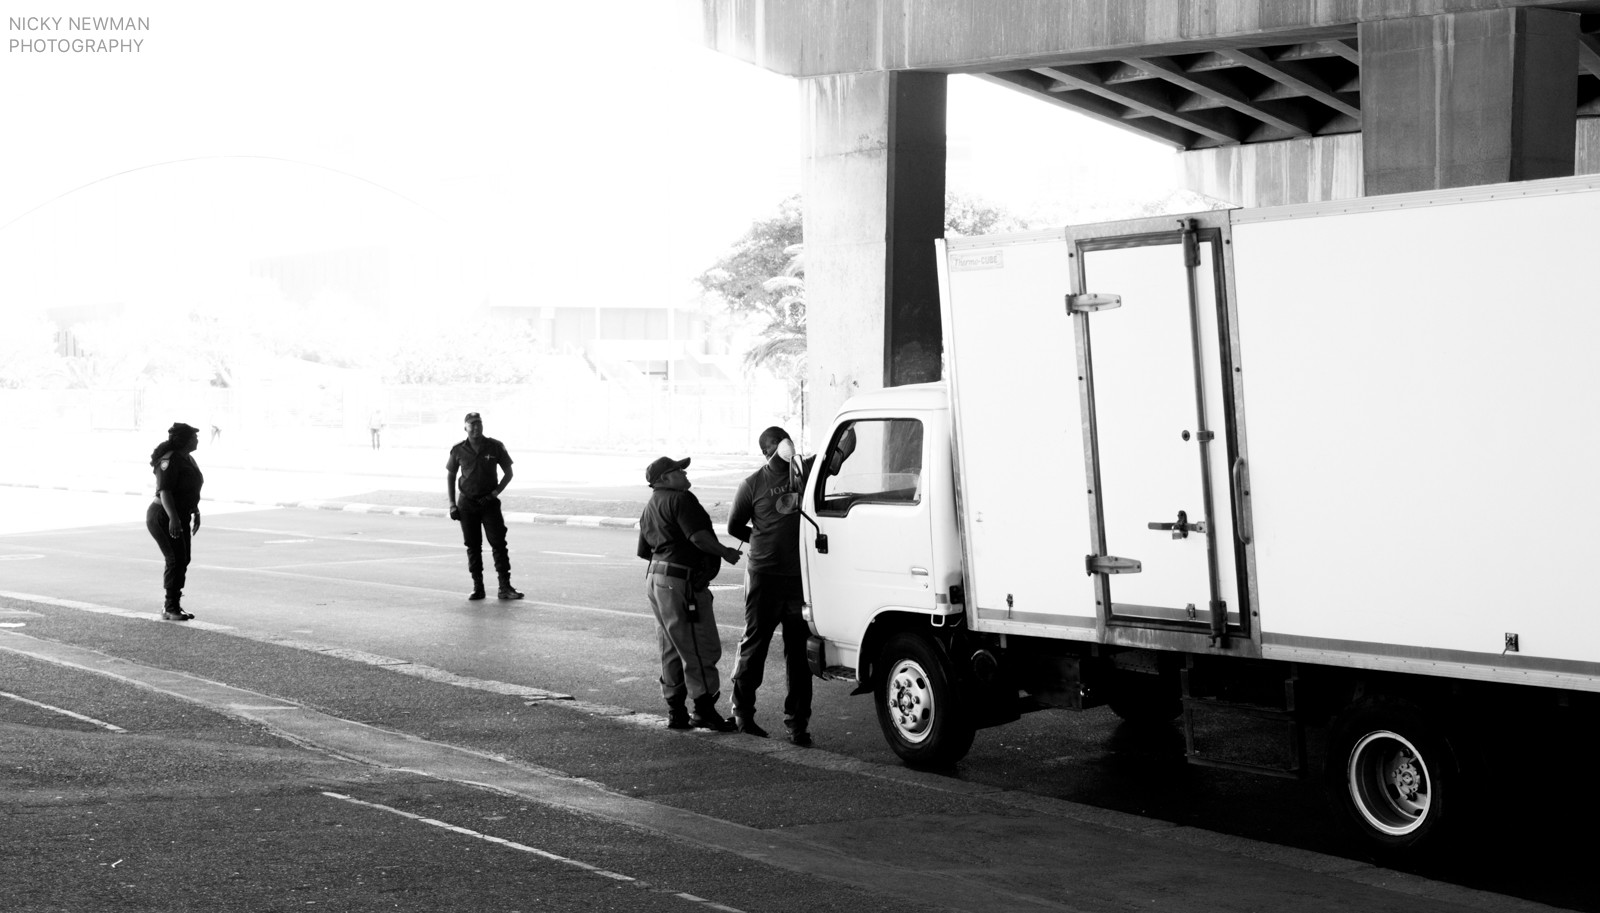 CV CT w wm fb bw truck-1.jpg